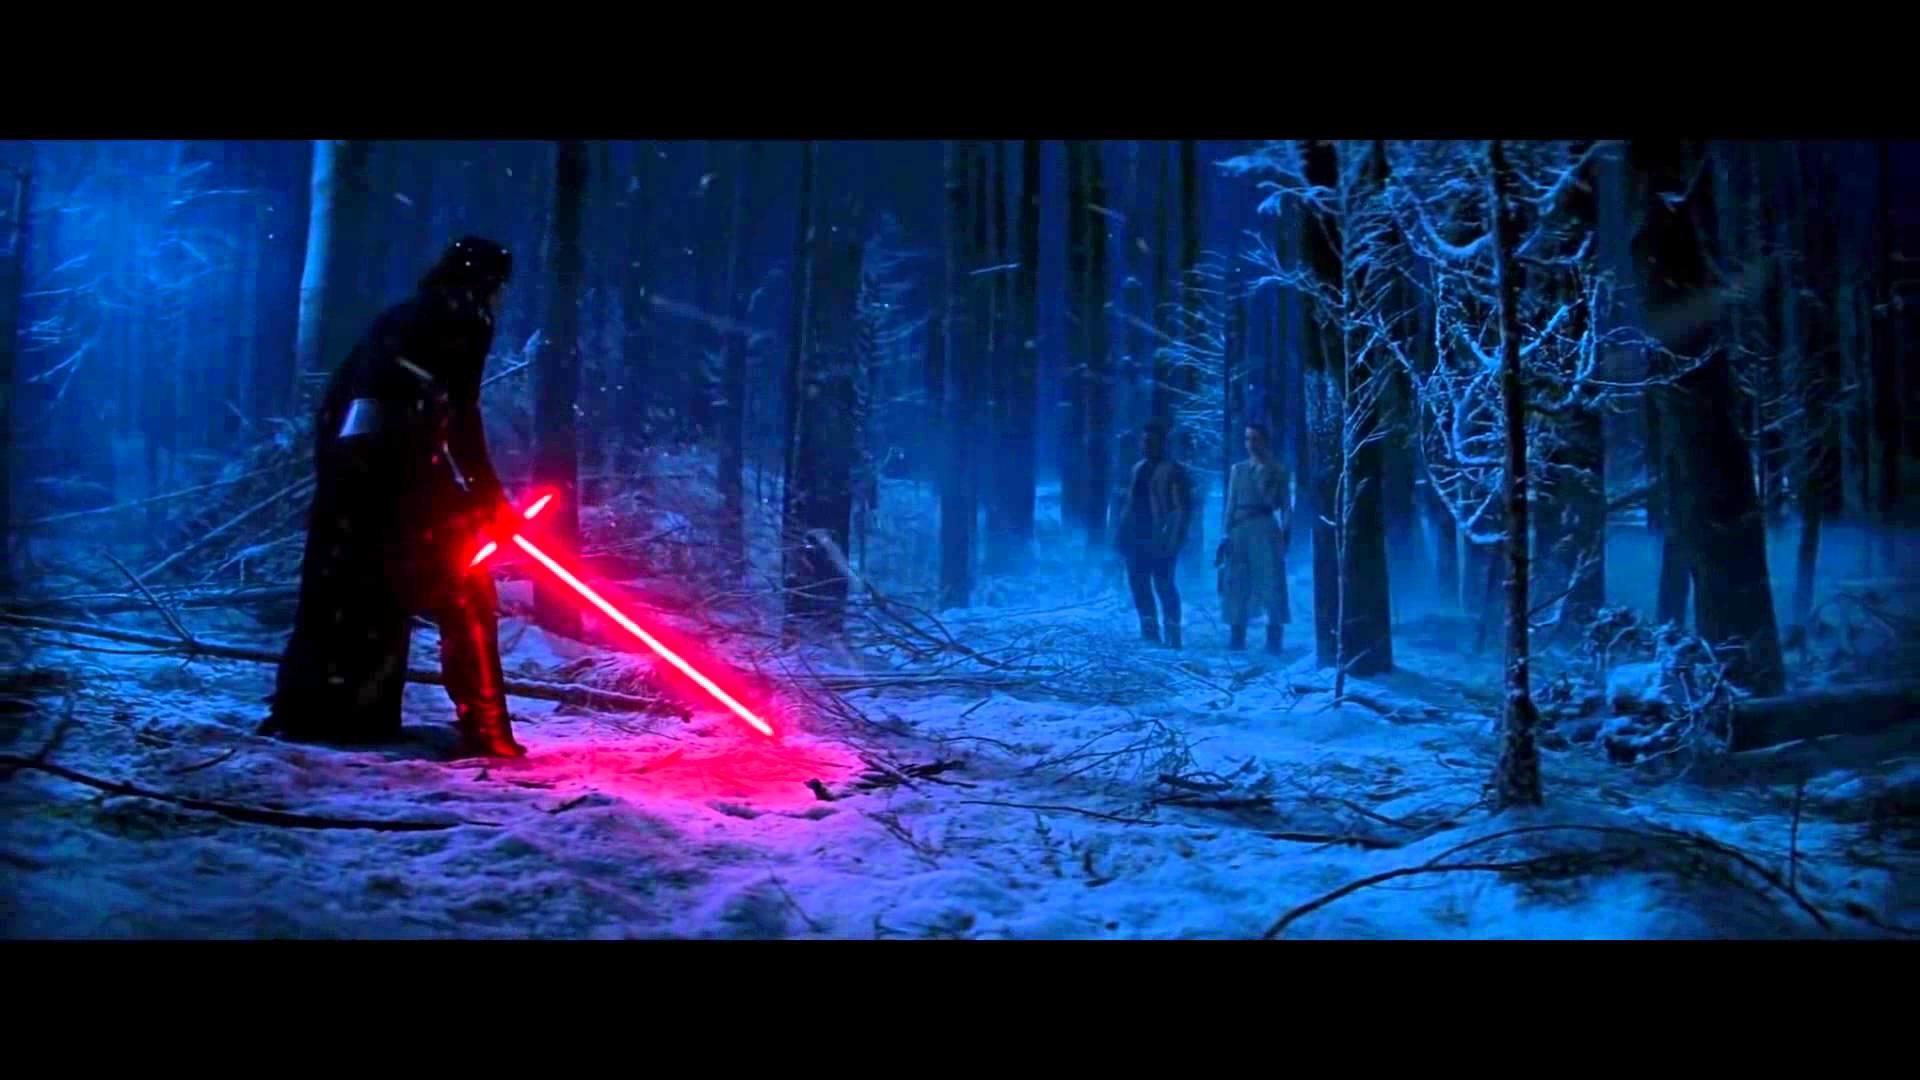 [HD] Kylo Ren vs Finn and Rey scene – Star Wars 7 – YouTube